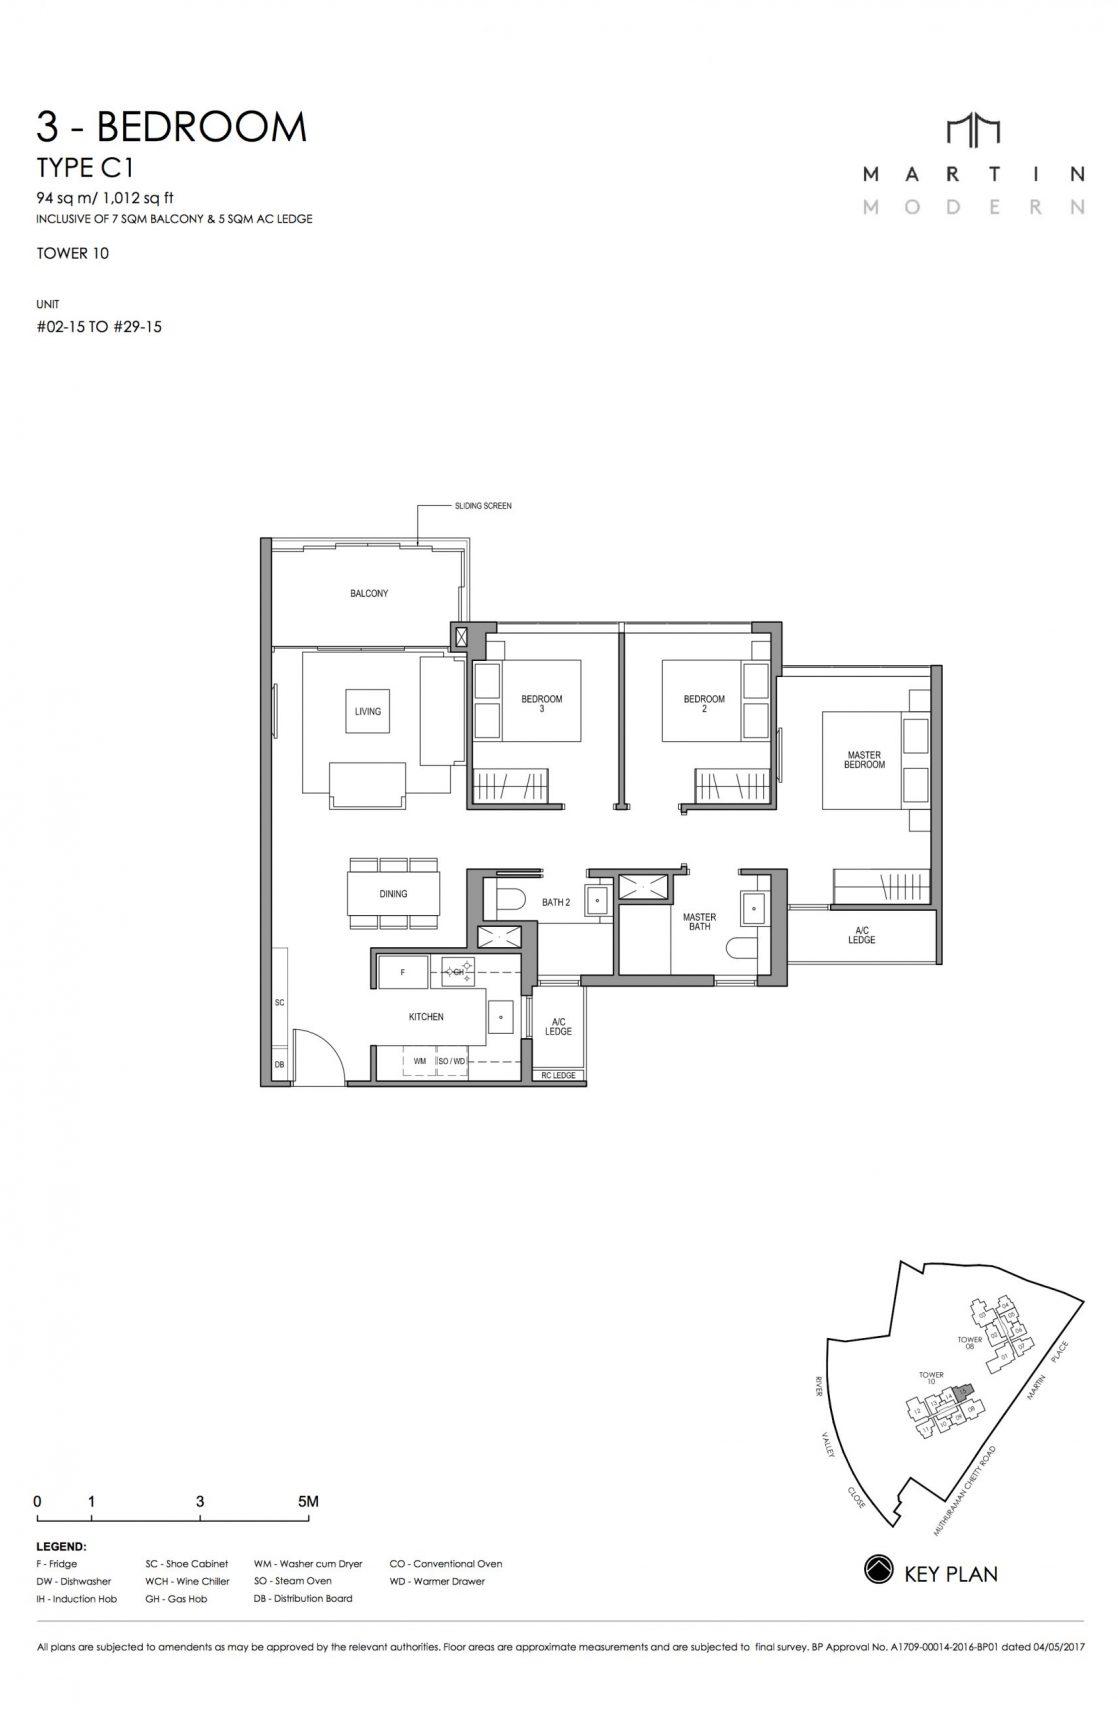 MARTIN MODERN 3-Bedroom TYPE C1